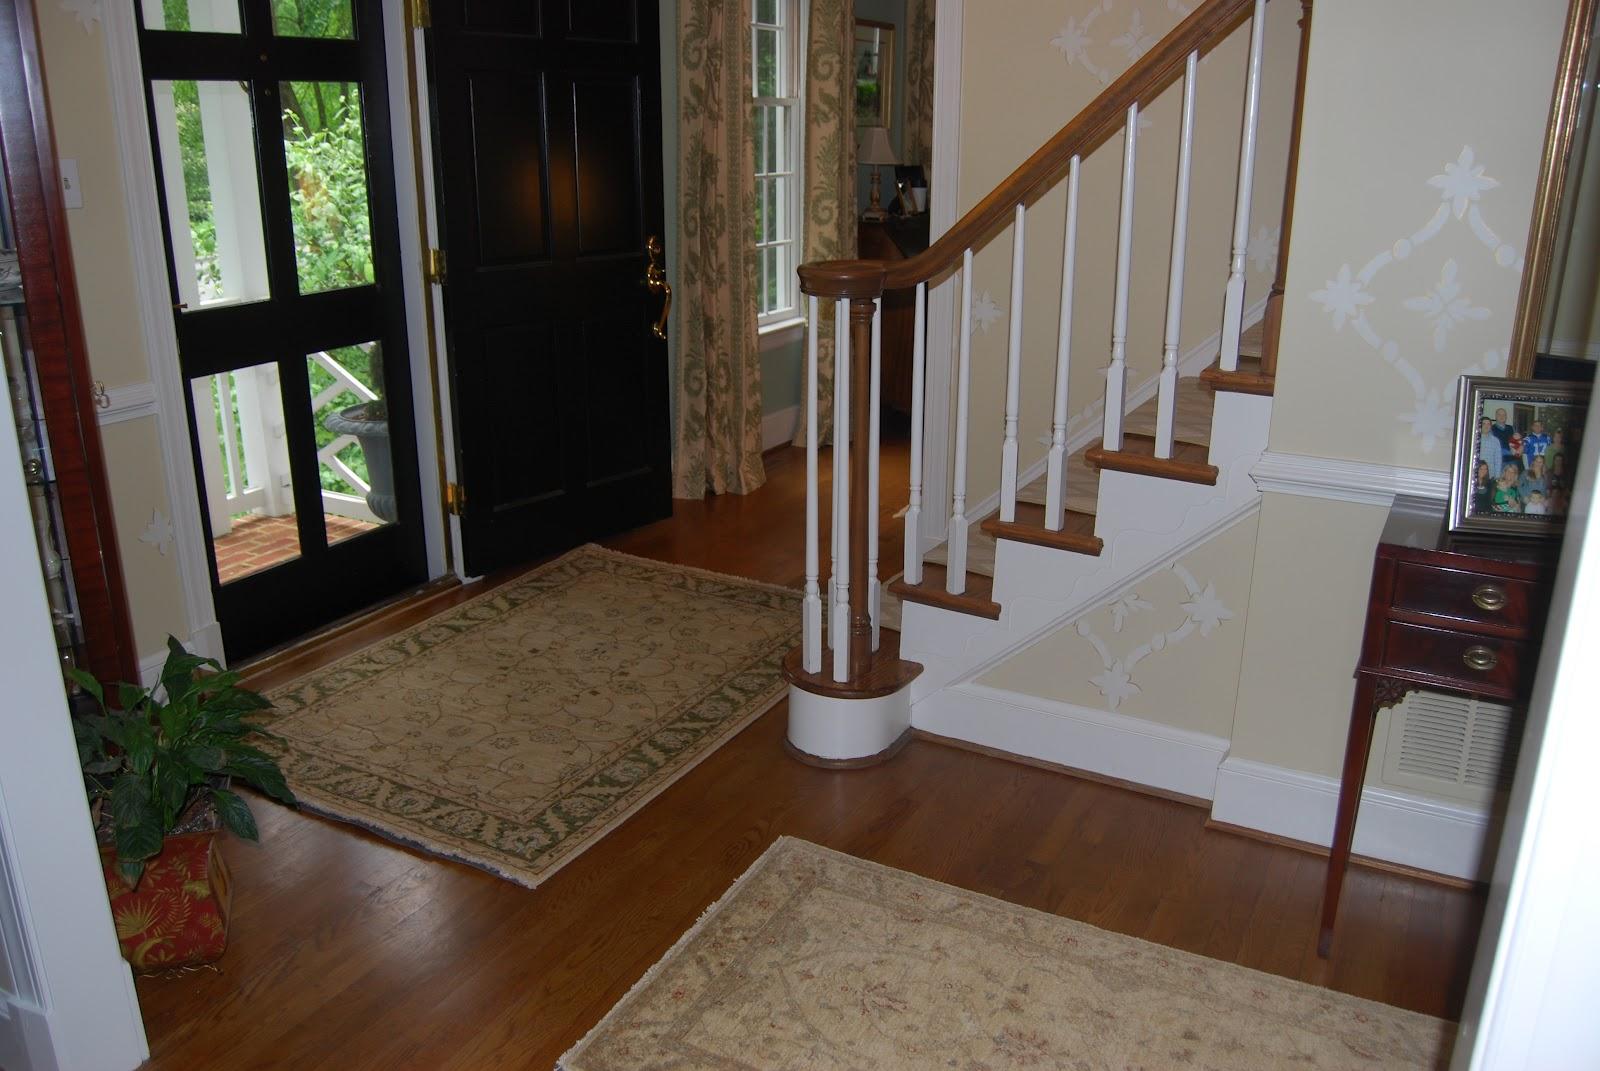 Foyer Rug Winter : Entryway rugs entry rug runner u with best